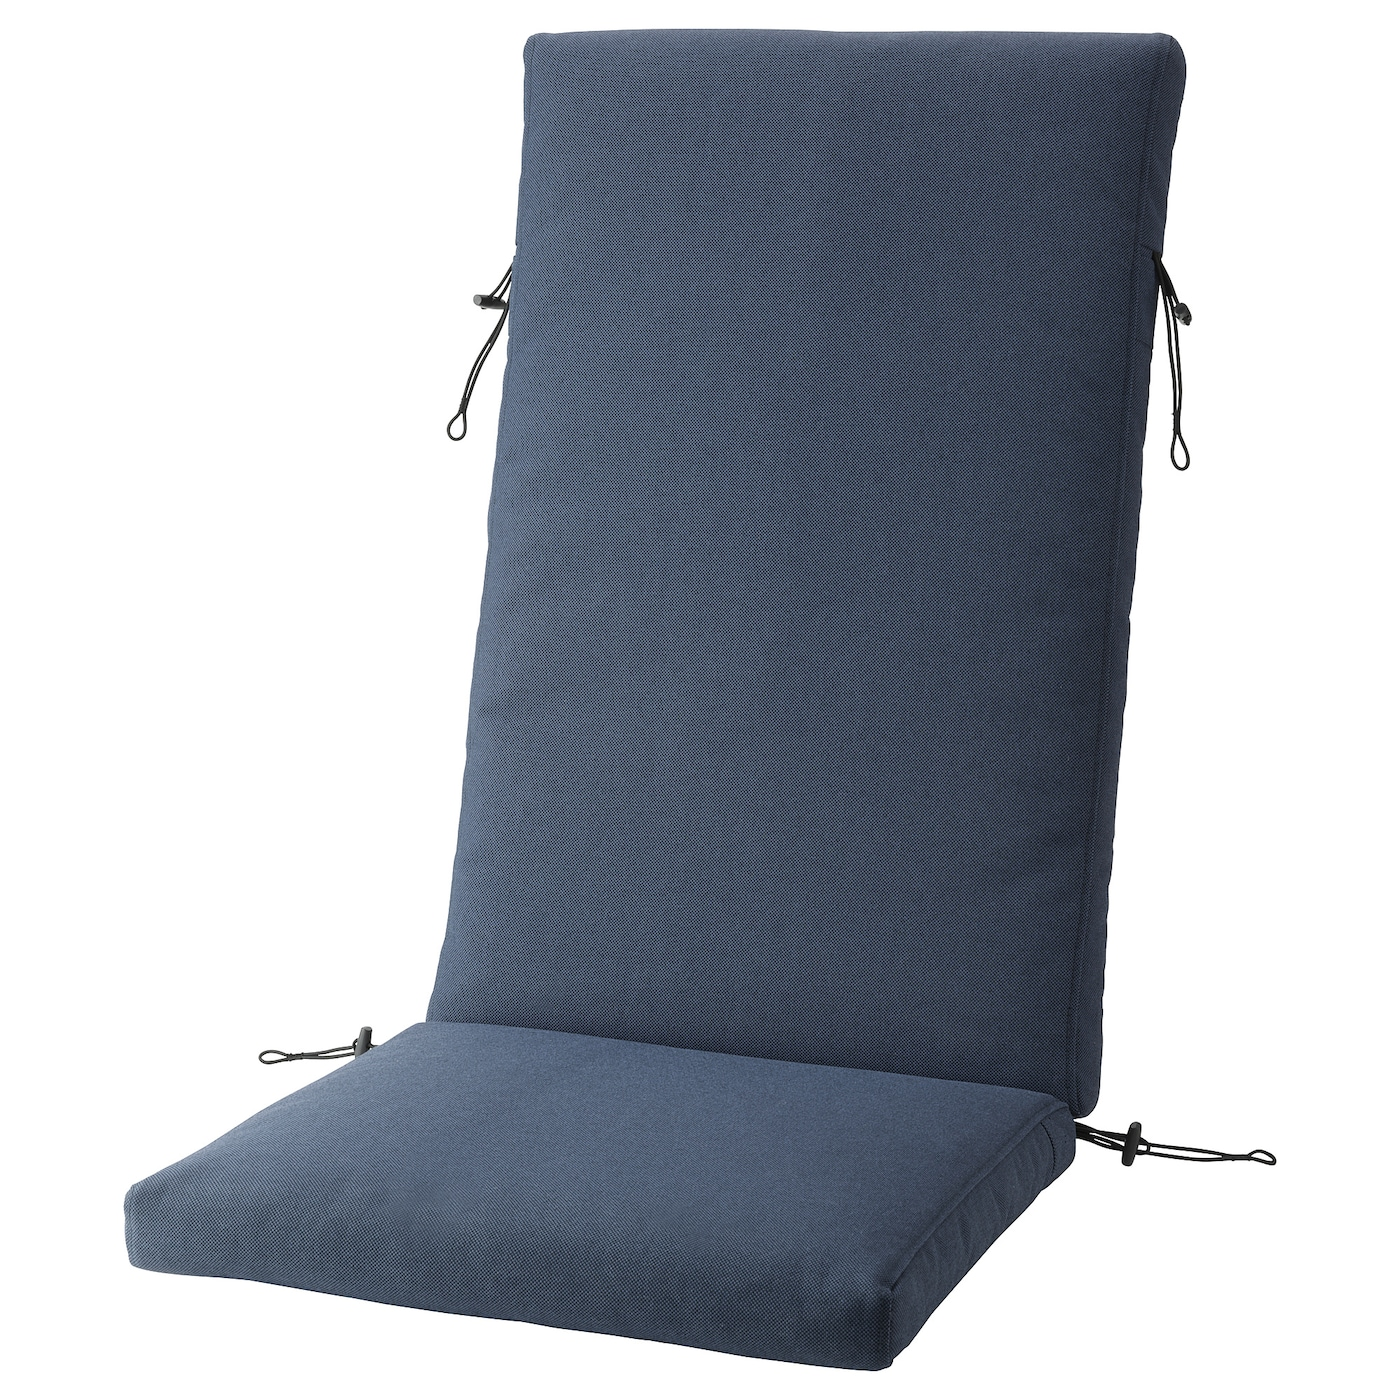 fr s n duvholmen coussin assise dossier ext rieur beige 116x45 cm ikea. Black Bedroom Furniture Sets. Home Design Ideas